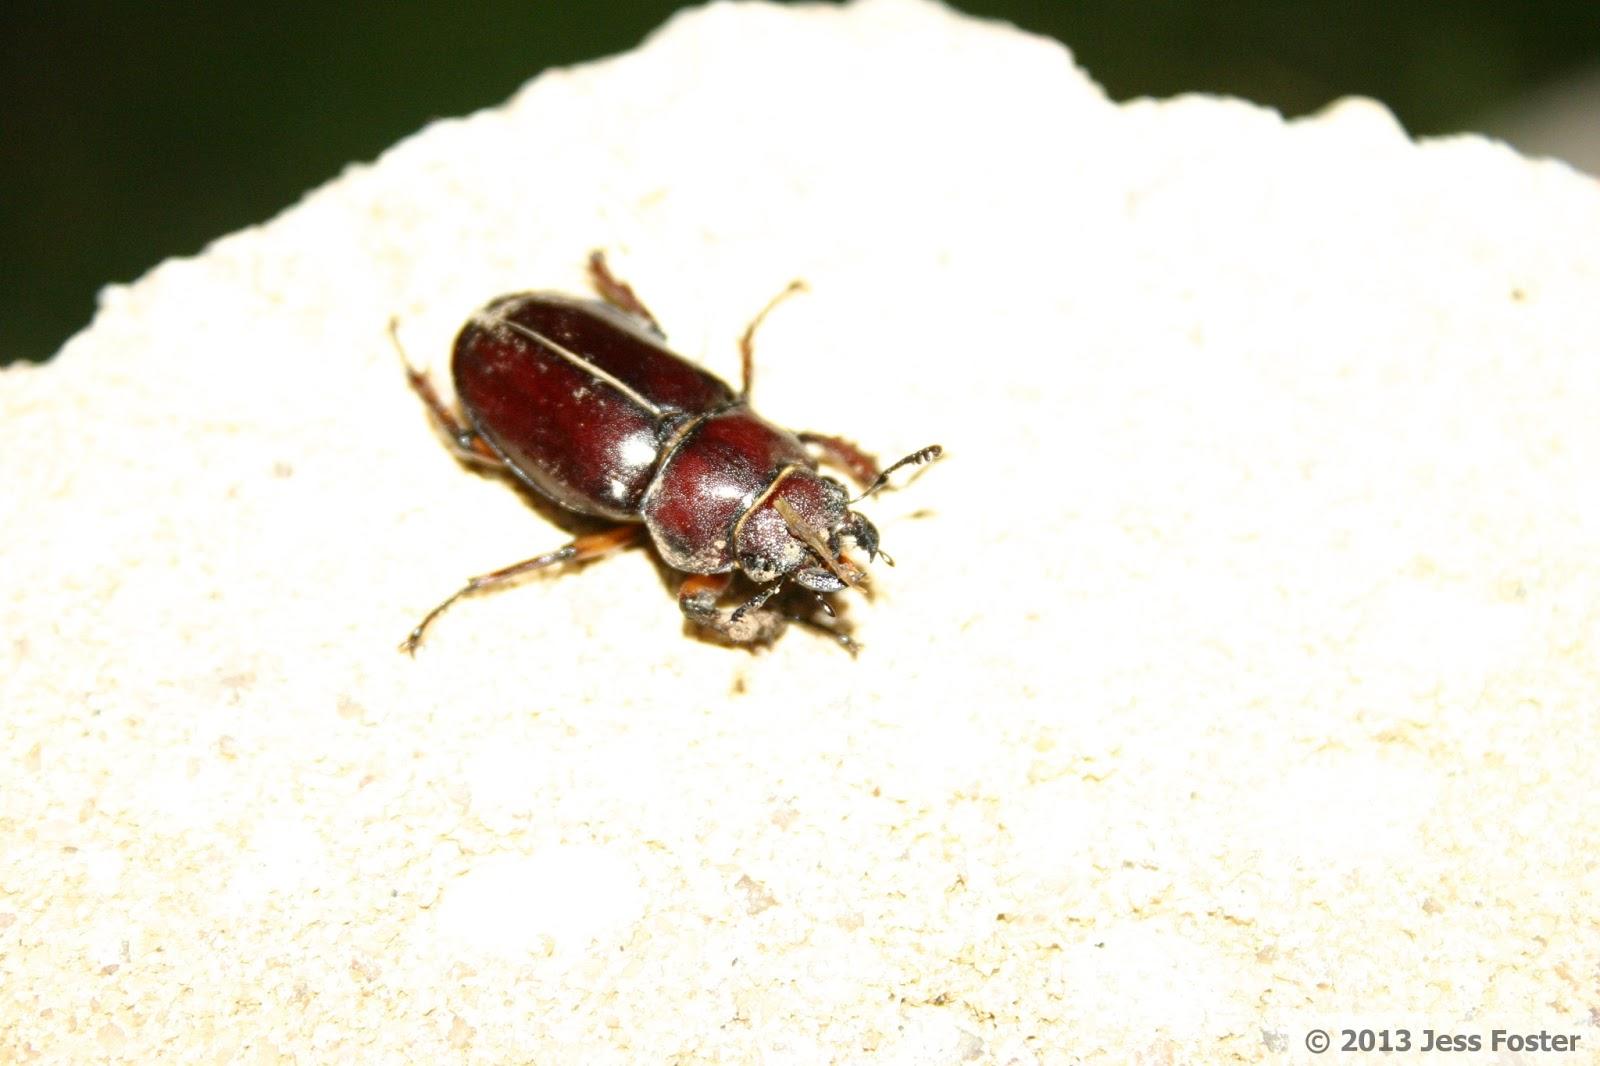 Sluggin' Along: Reddish-brown Stag Beetle